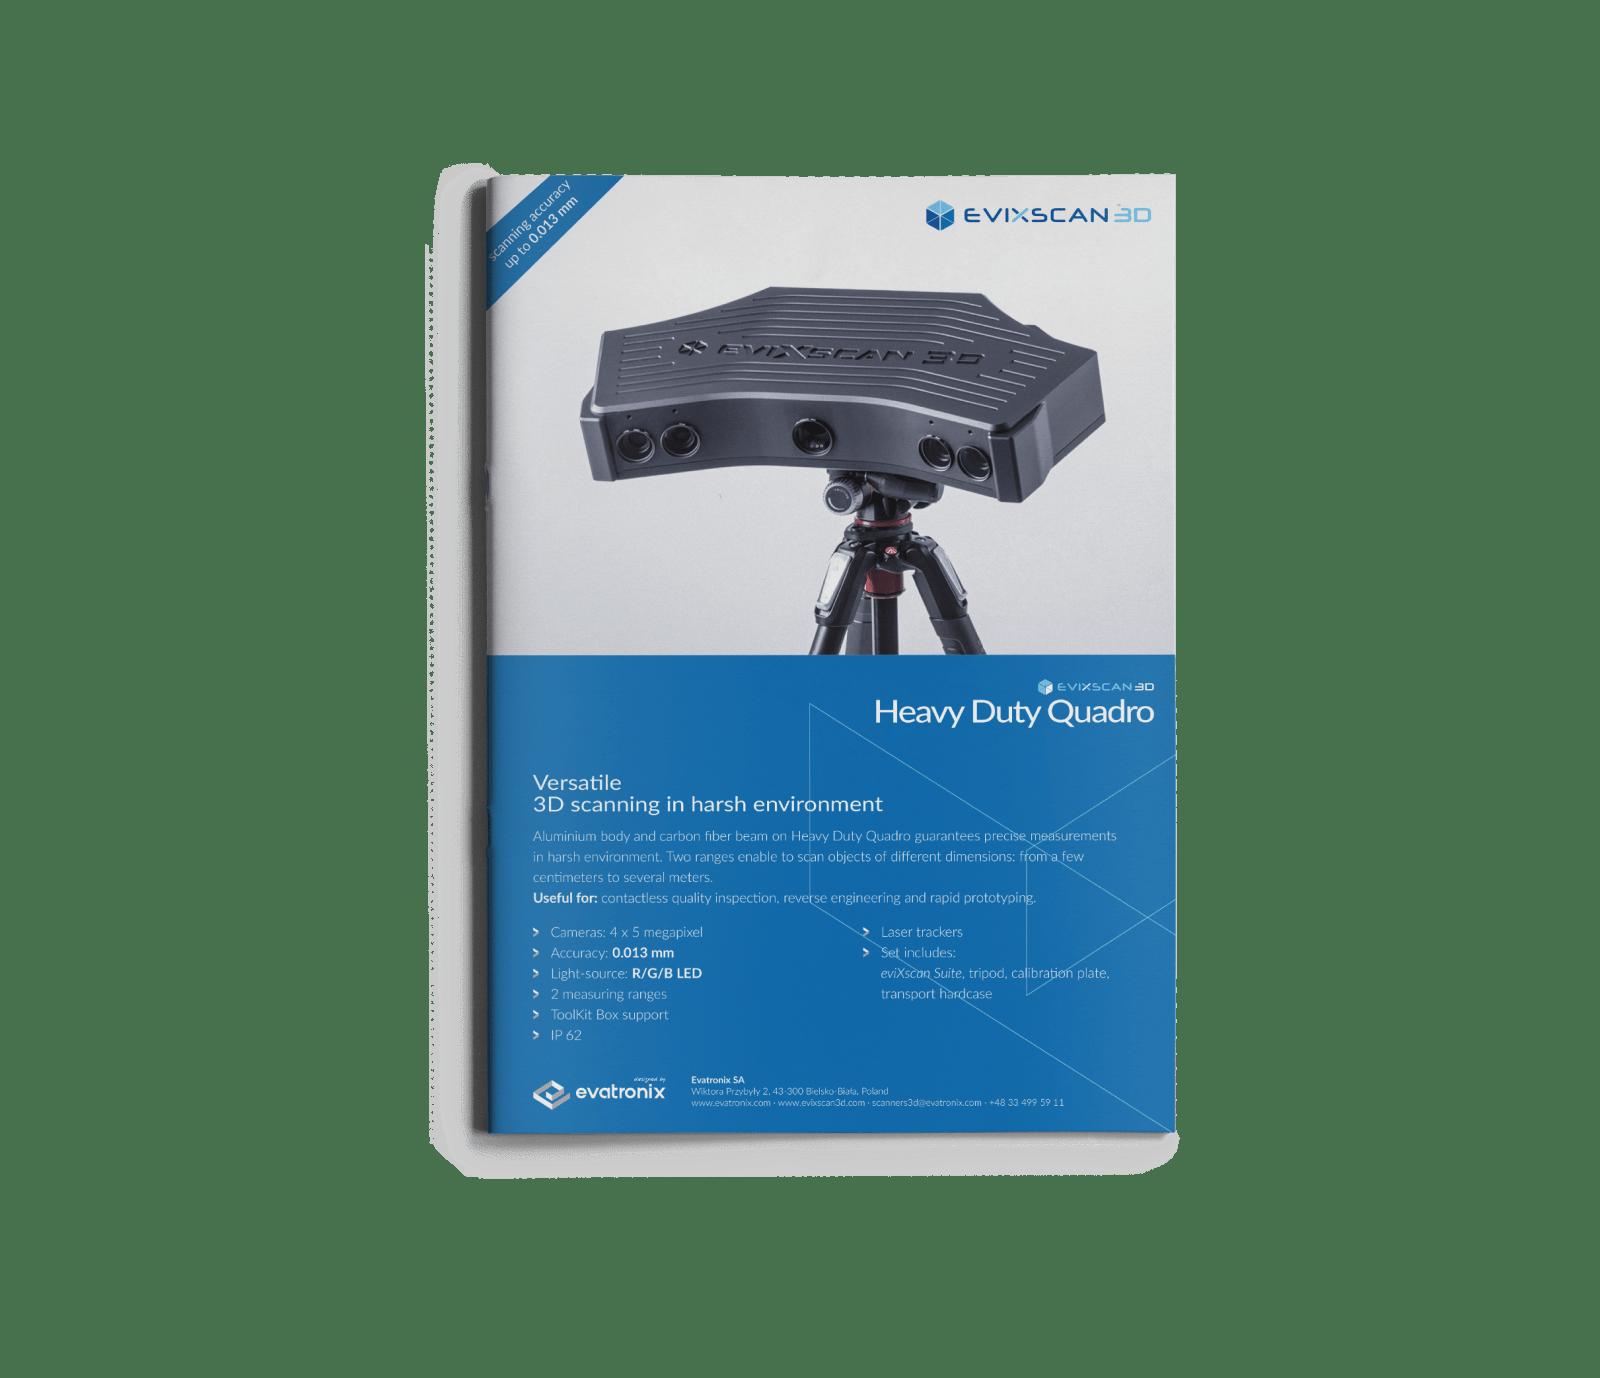 evixscan 3d foldery reklamowe (1)